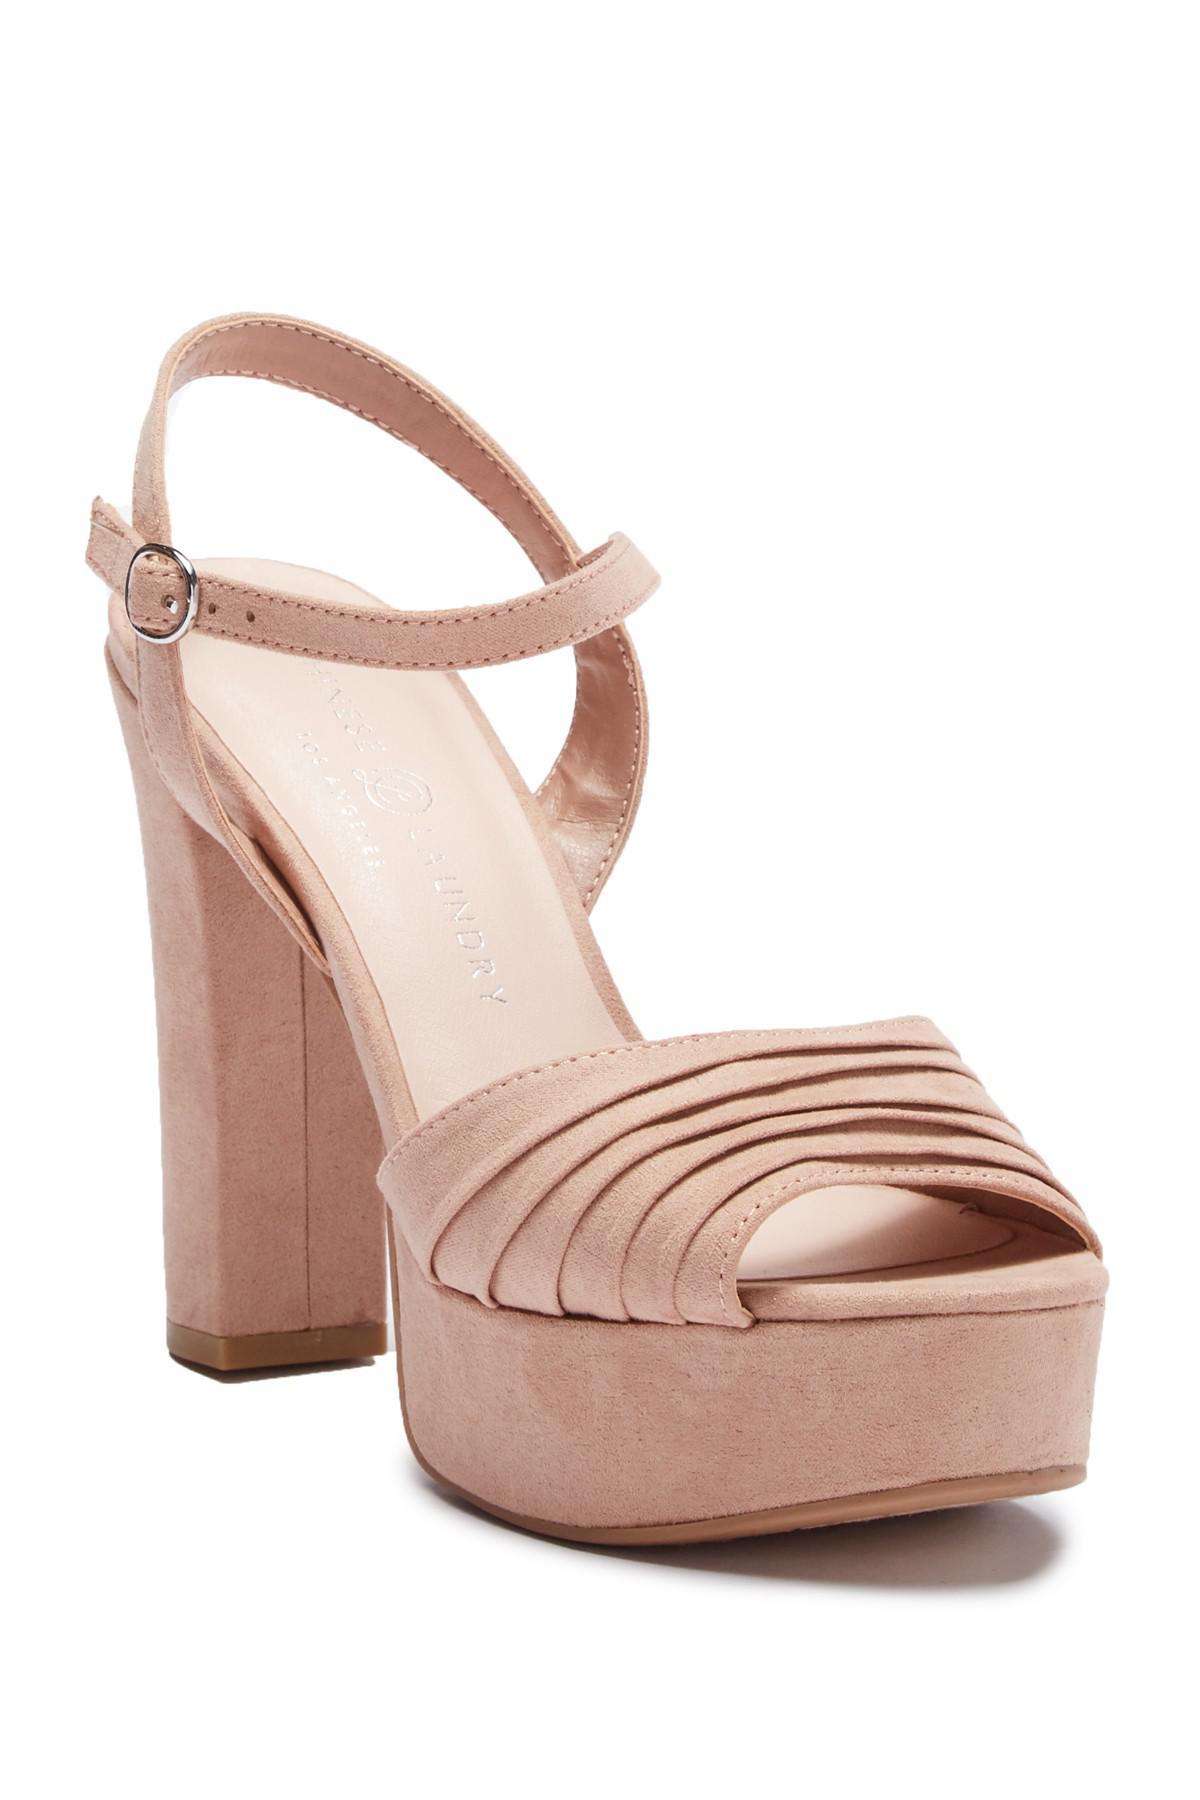 9d2e273139b6 Chinese Laundry. Women s Allie Pleated Platform Sandal